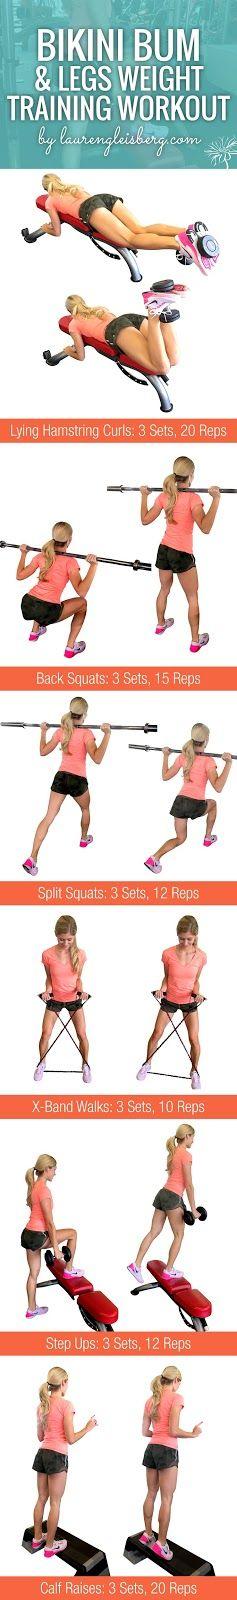 BIKINI BUM & LEG WEIGHT TRAINING WORKOUT | Click for the full ConfidenceKini Fitness Challenge by LaurenGleisberg.com